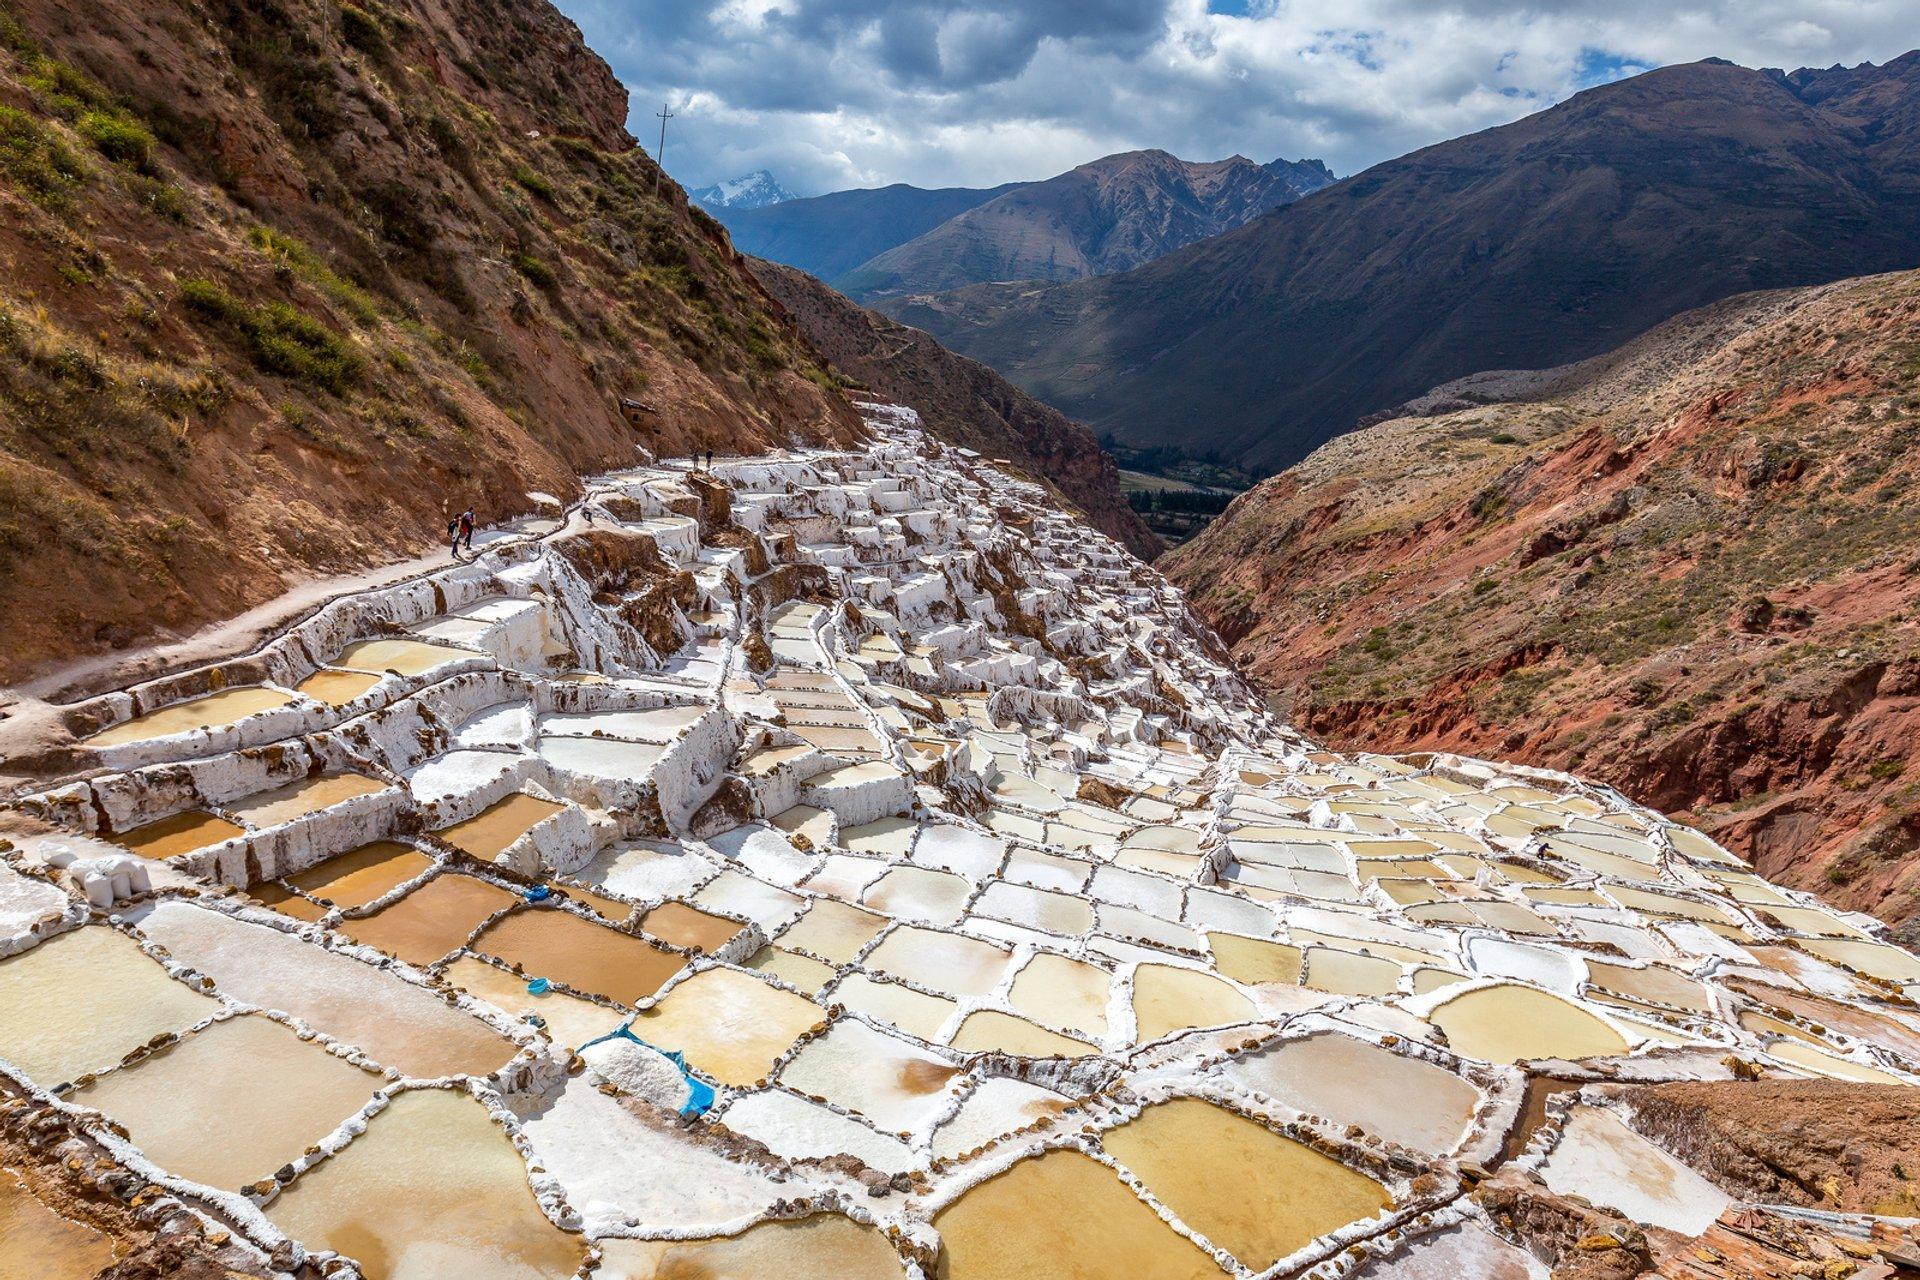 Salt Harvest at Salinas de Maras in Peru 2020 - Best Time